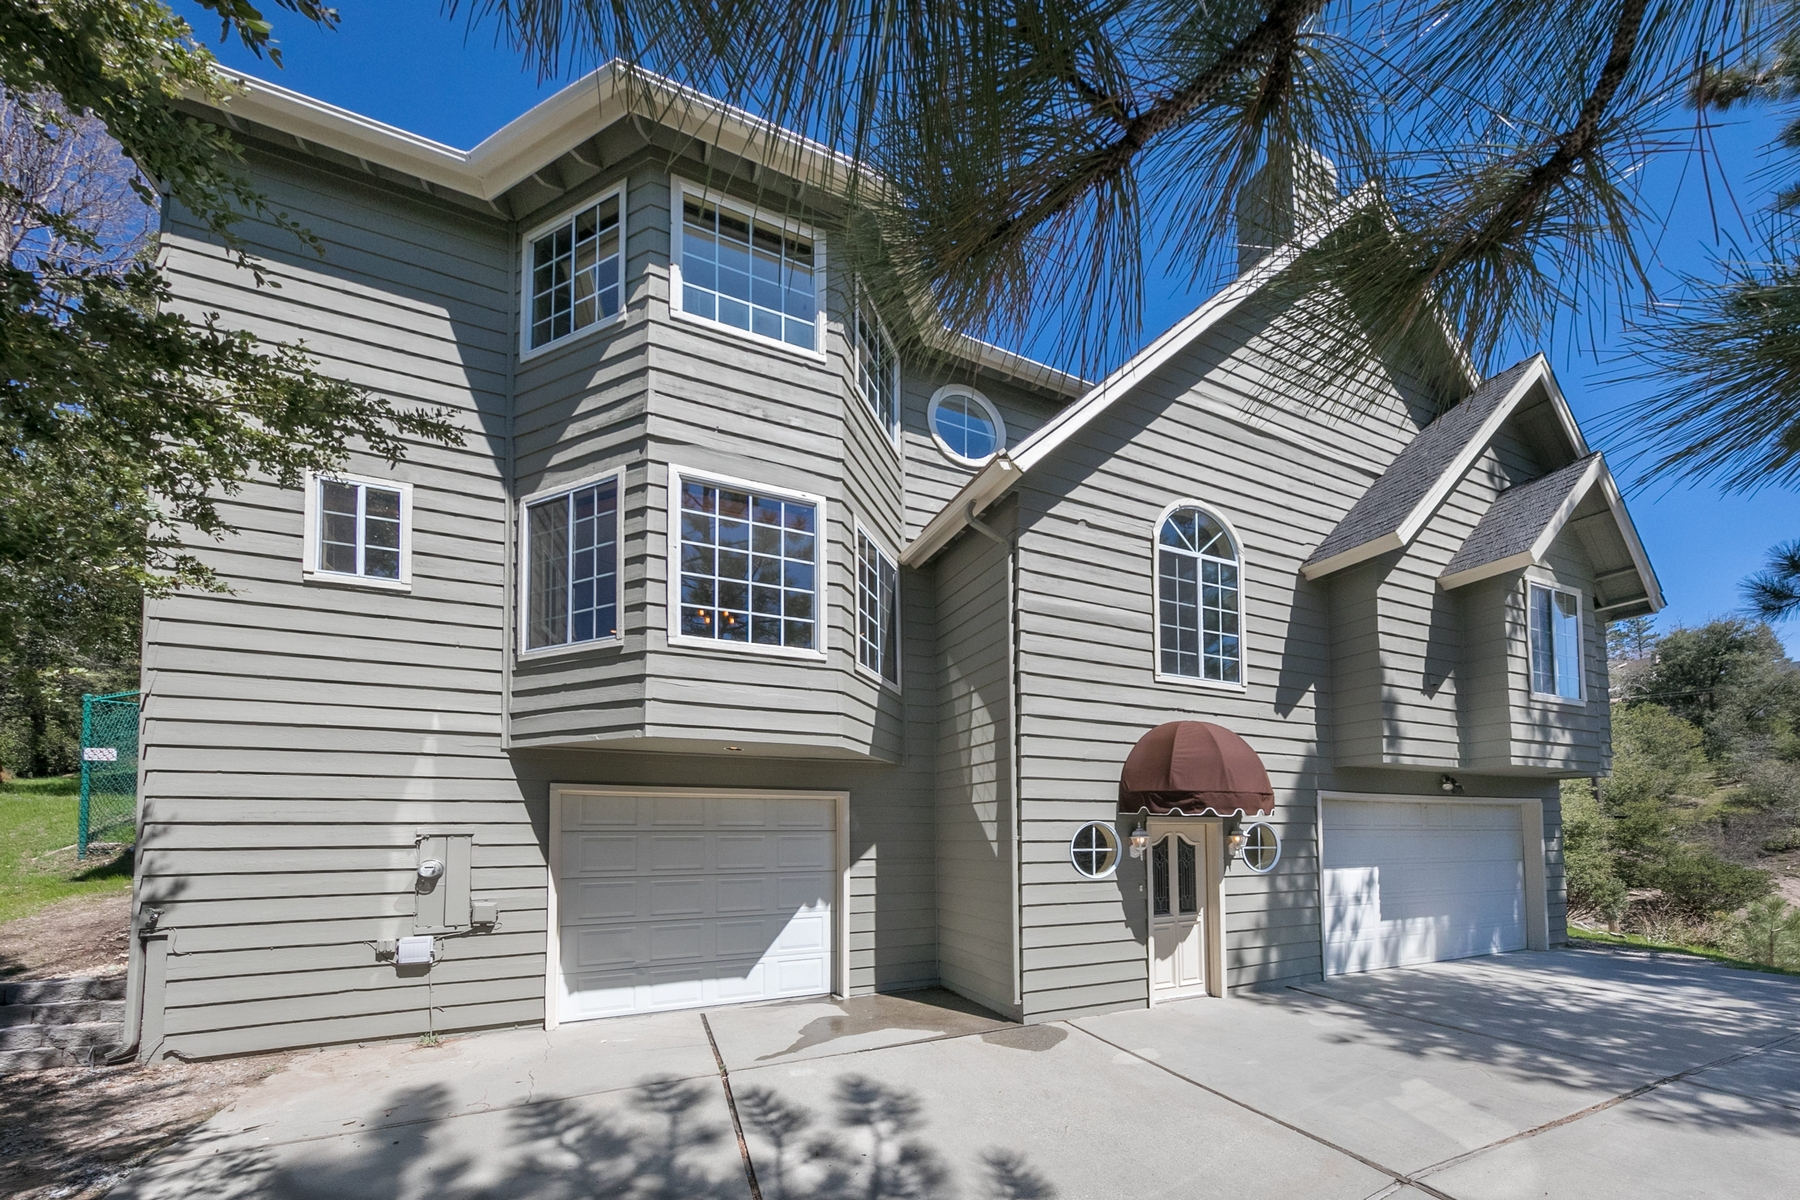 Single Family Home for Sale at 1120 Sandalwood Court Lake Arrowhead, California 92352 United States